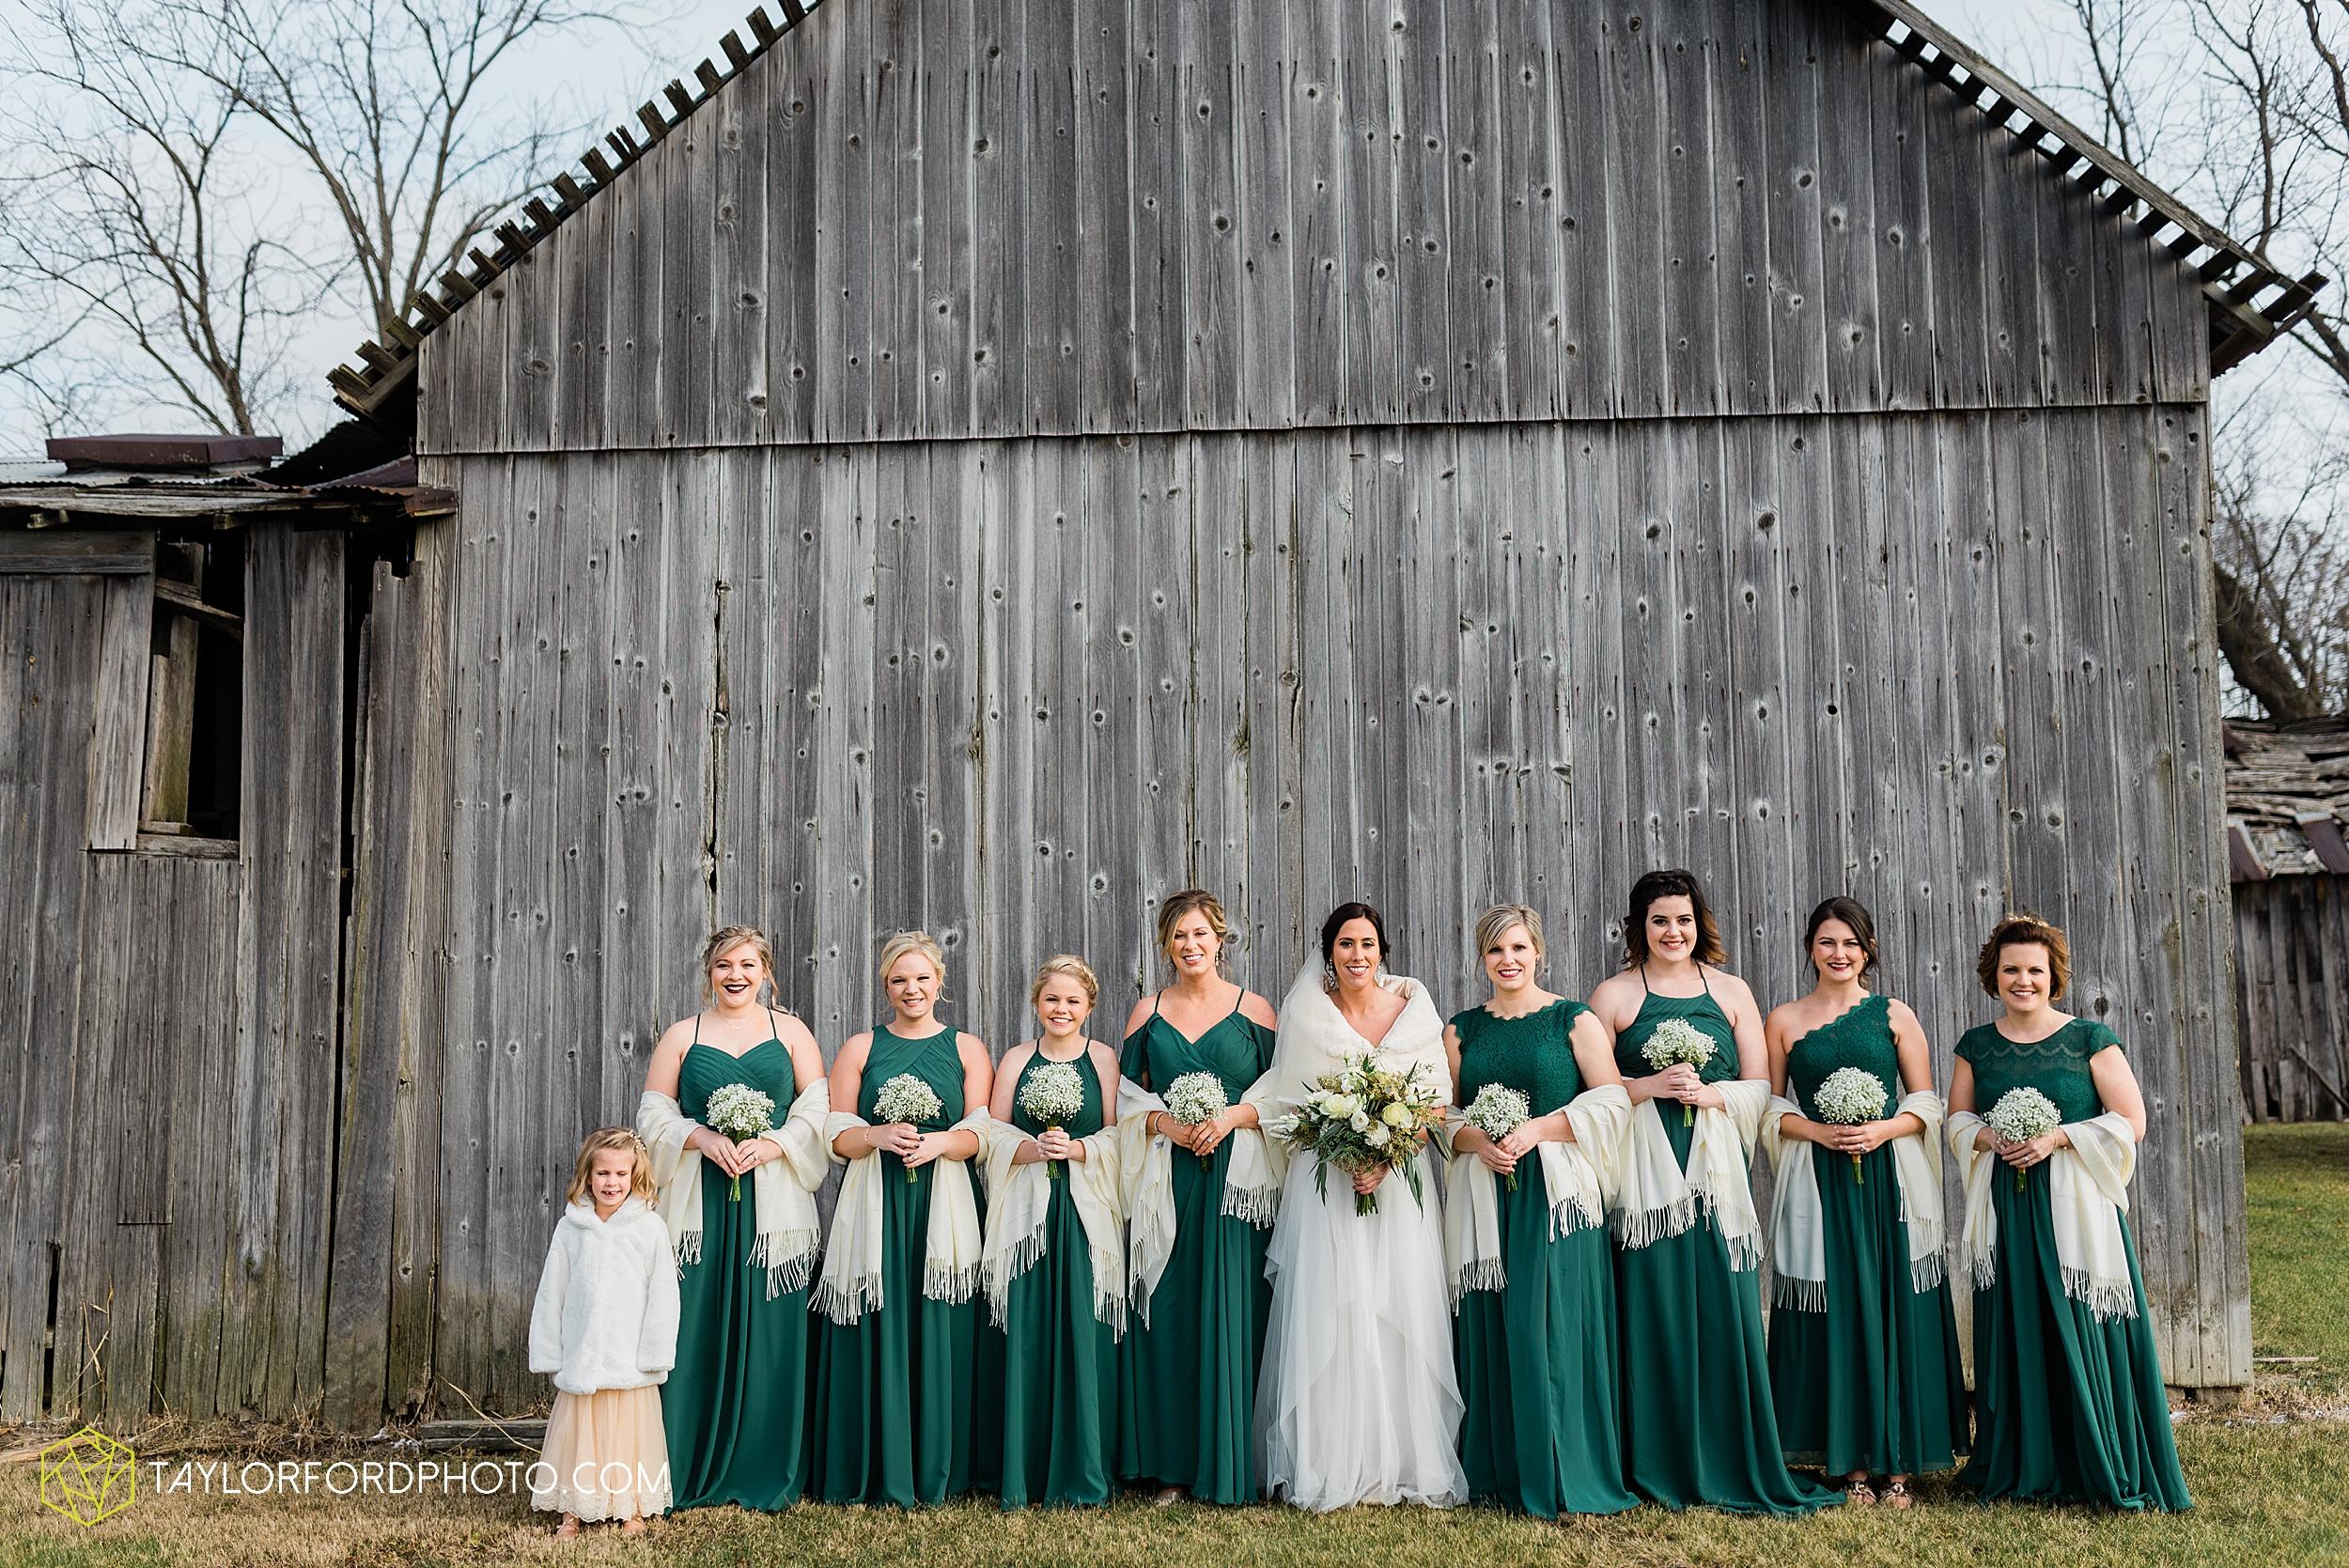 van-wert-ohio-first-united-methodist-downtown-van-wert-county-jr-fair-building-reception-winter-christmas-wedding-photographer-taylor-ford-hirschy-photographer_1881.jpg